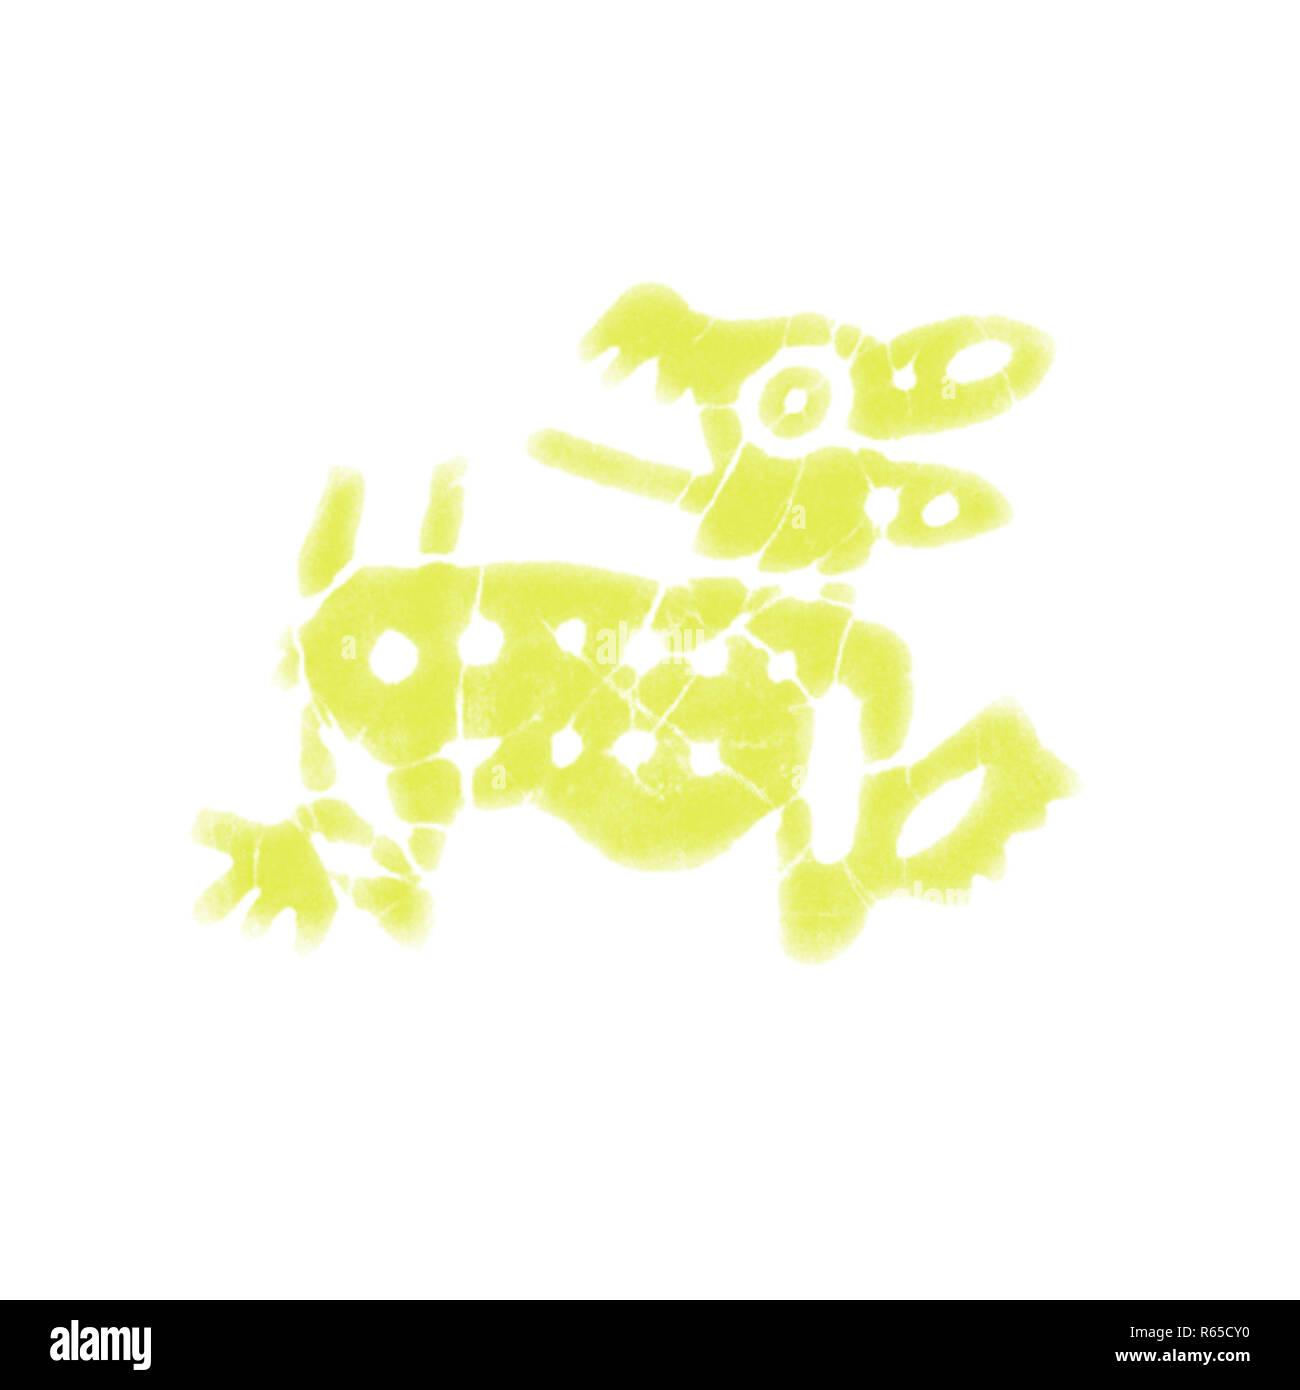 Primitive Tribal Animal Drawings - 5b.jpg - R65CY0 1R65CY0 - Stock Image